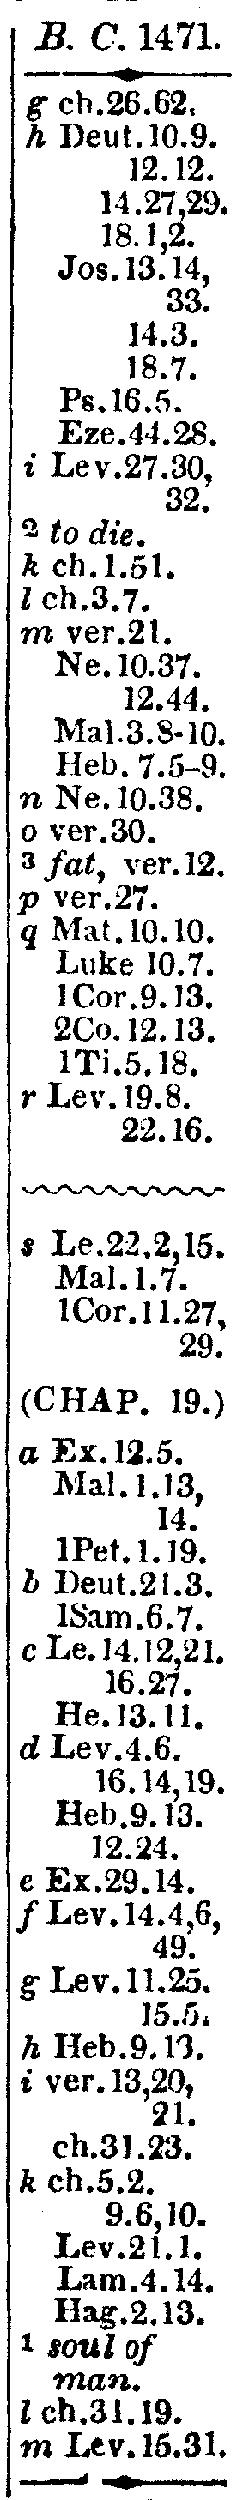 [ocr errors][ocr errors][merged small][merged small][merged small][merged small][merged small][merged small][merged small][merged small][merged small][ocr errors][ocr errors][ocr errors][merged small][ocr errors]